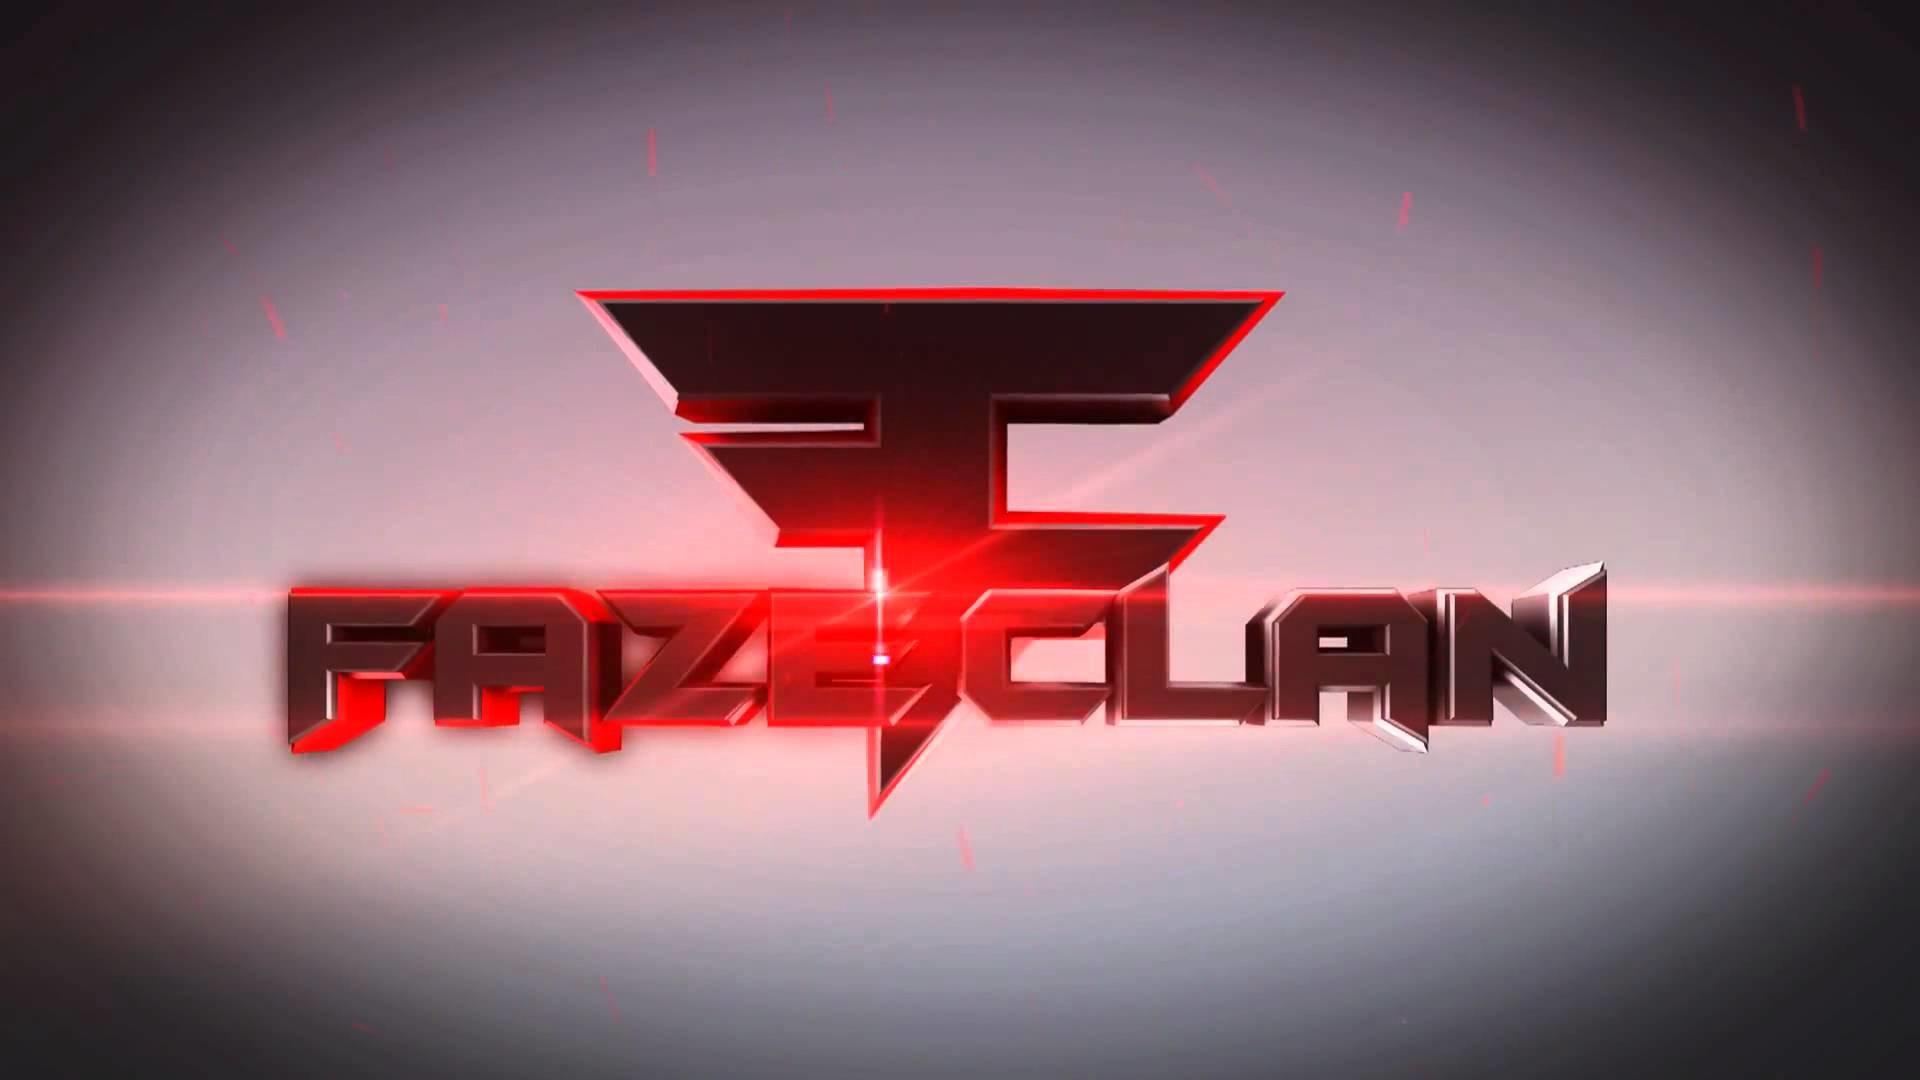 FaZe Clan Wallpaper HD – WallpaperSafari